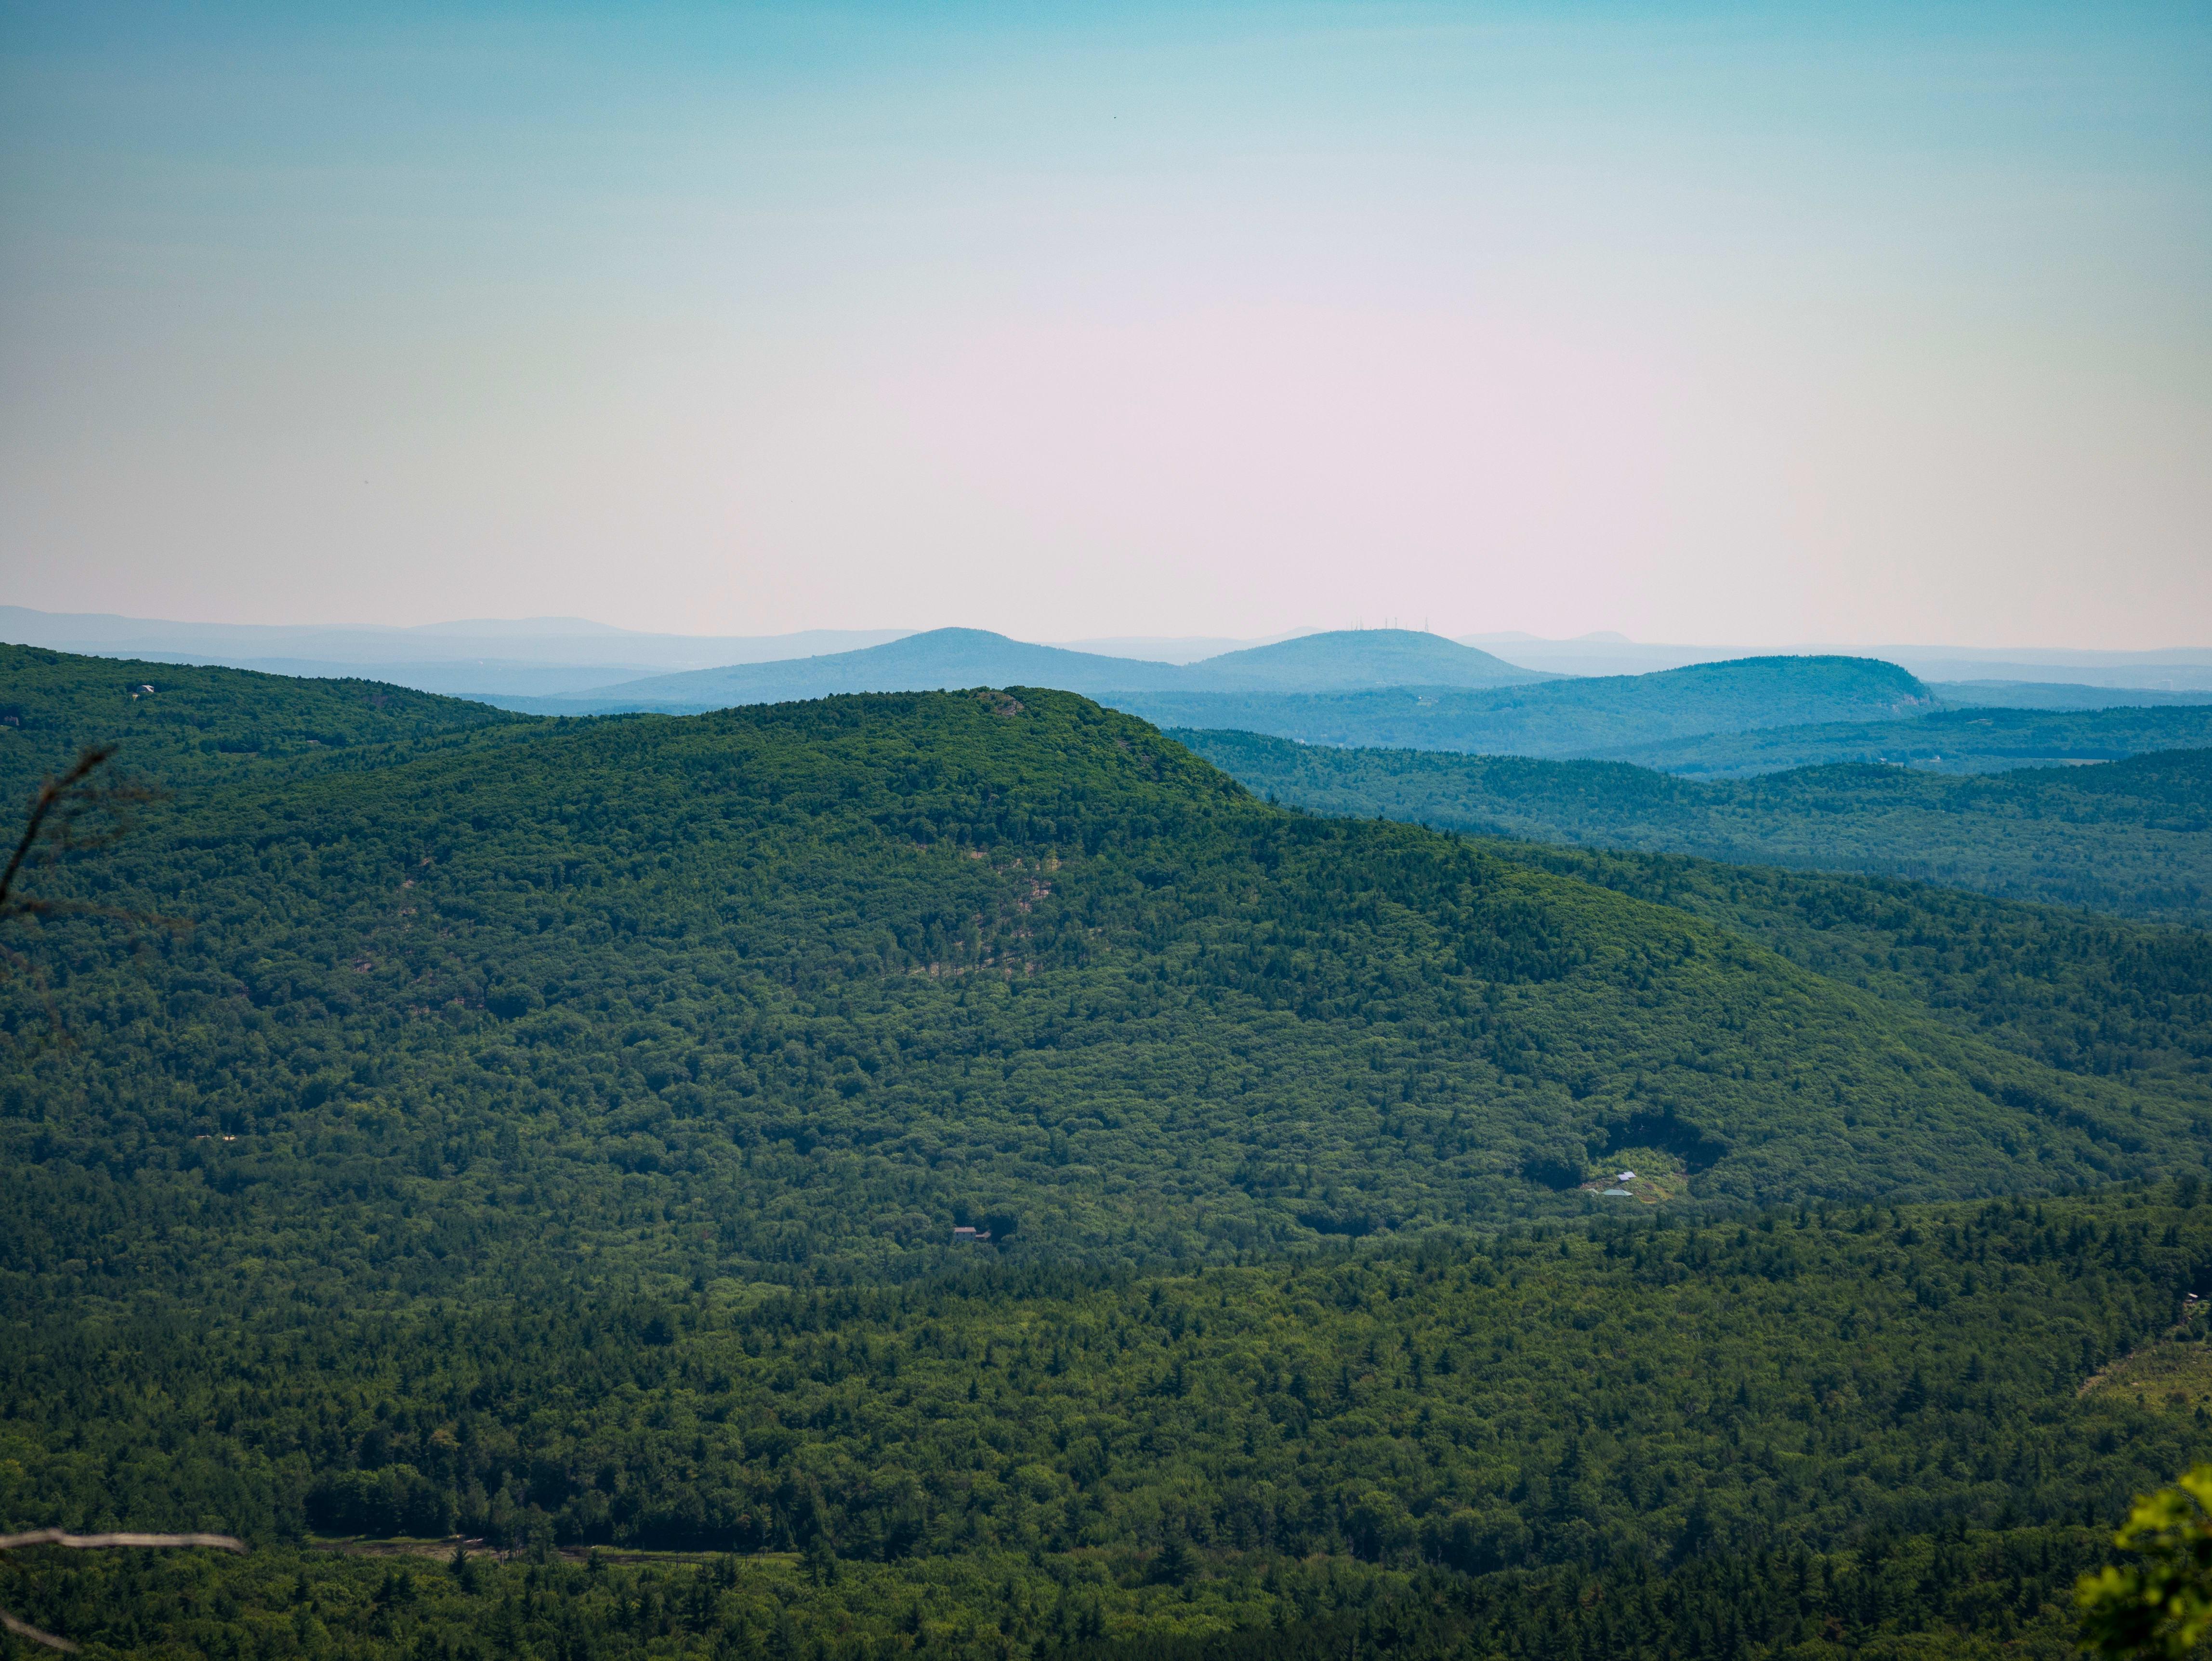 A photo taken by the Panasonic Lumix G7 of landscape.